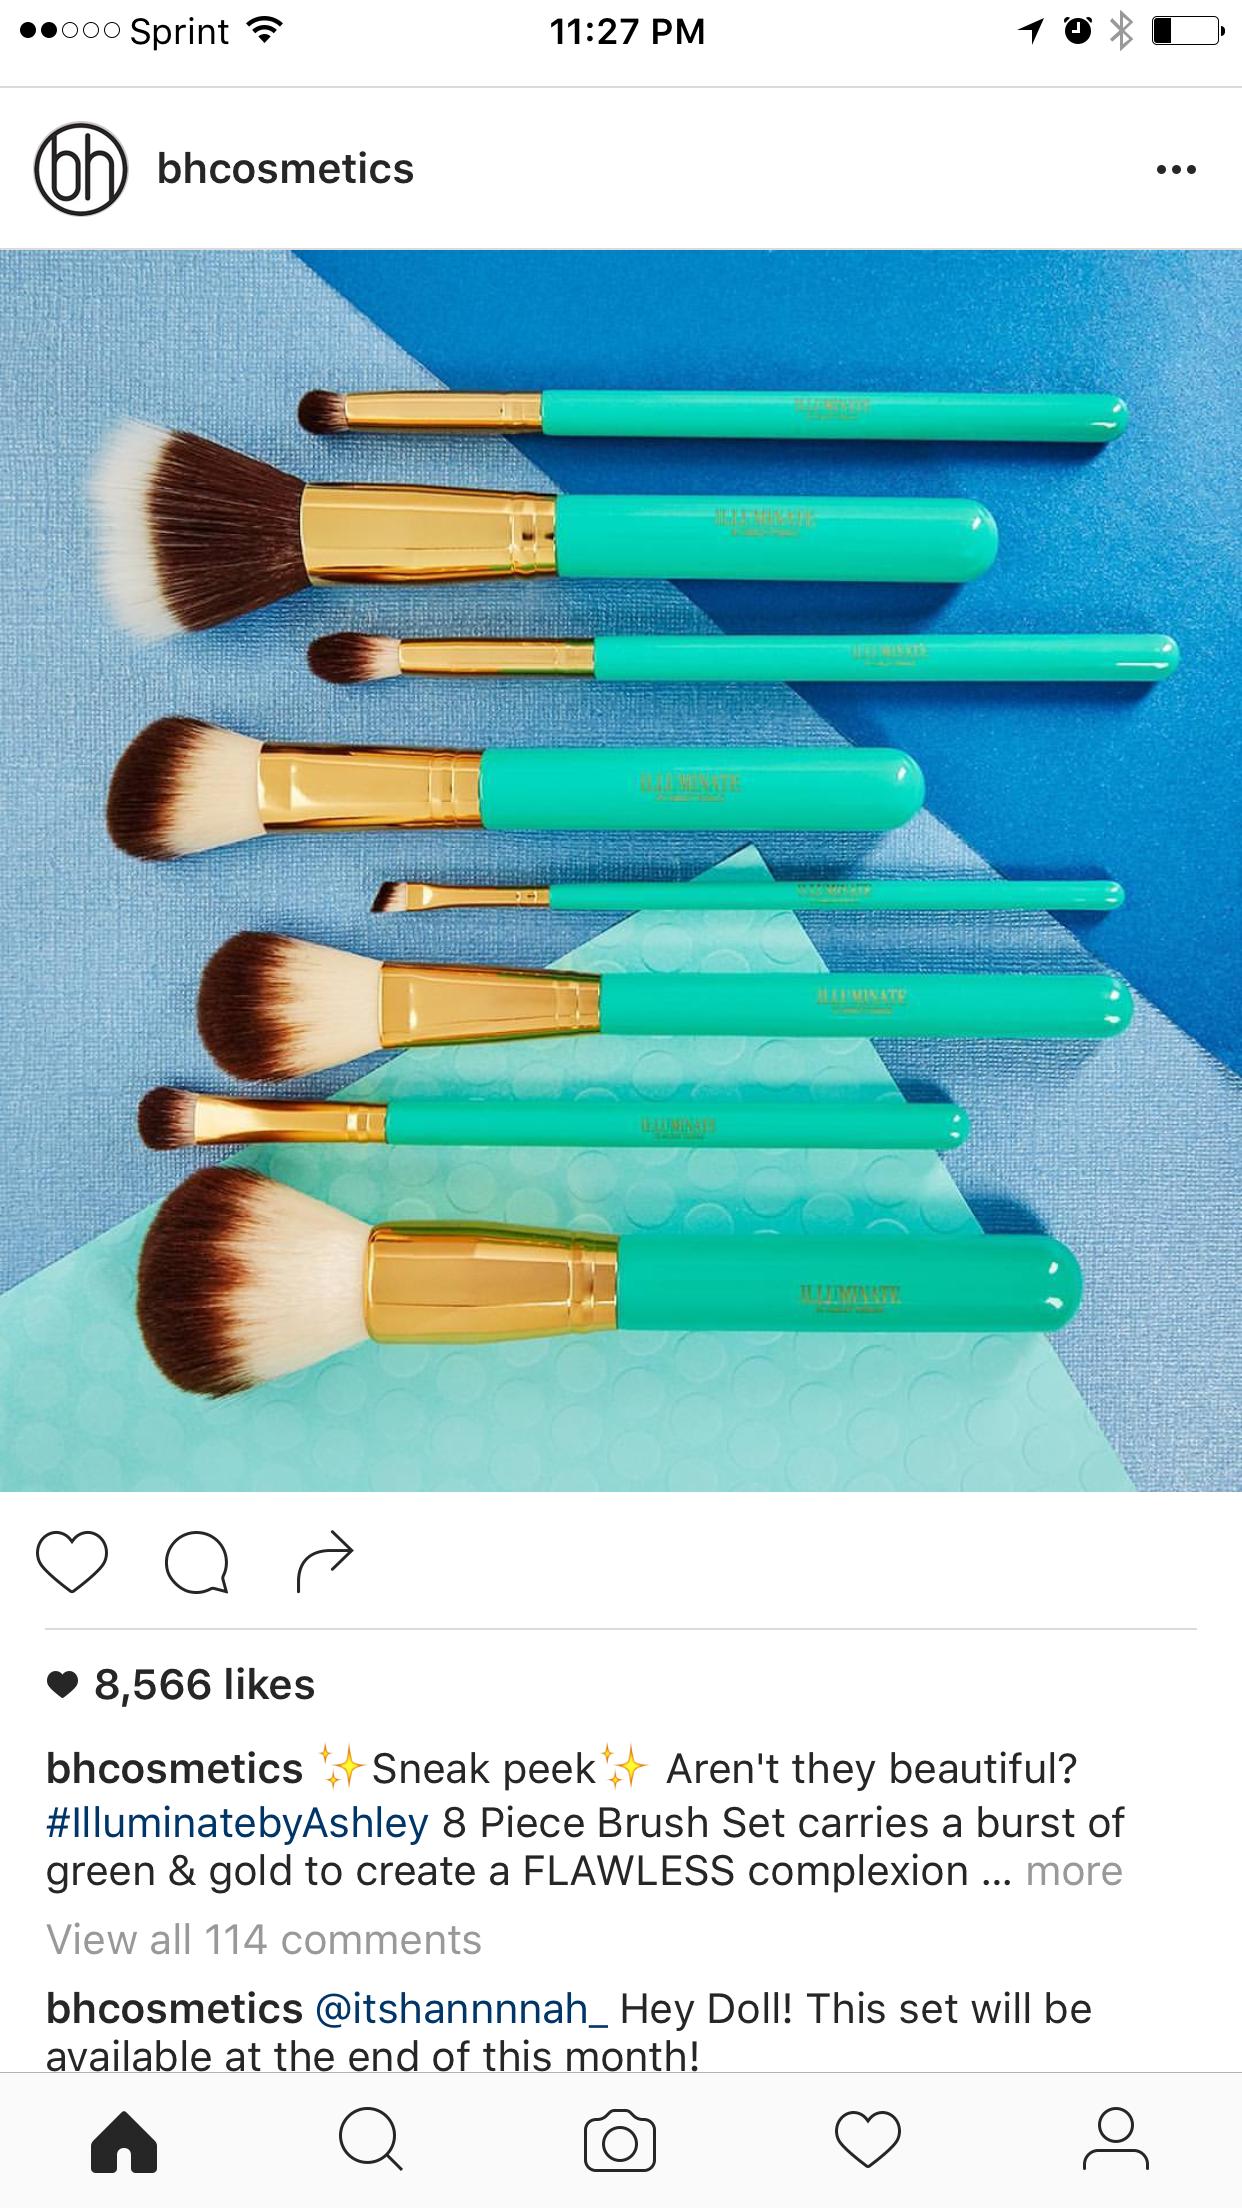 Pin by Jordan Quander on Beauty Bh cosmetics, Kylie